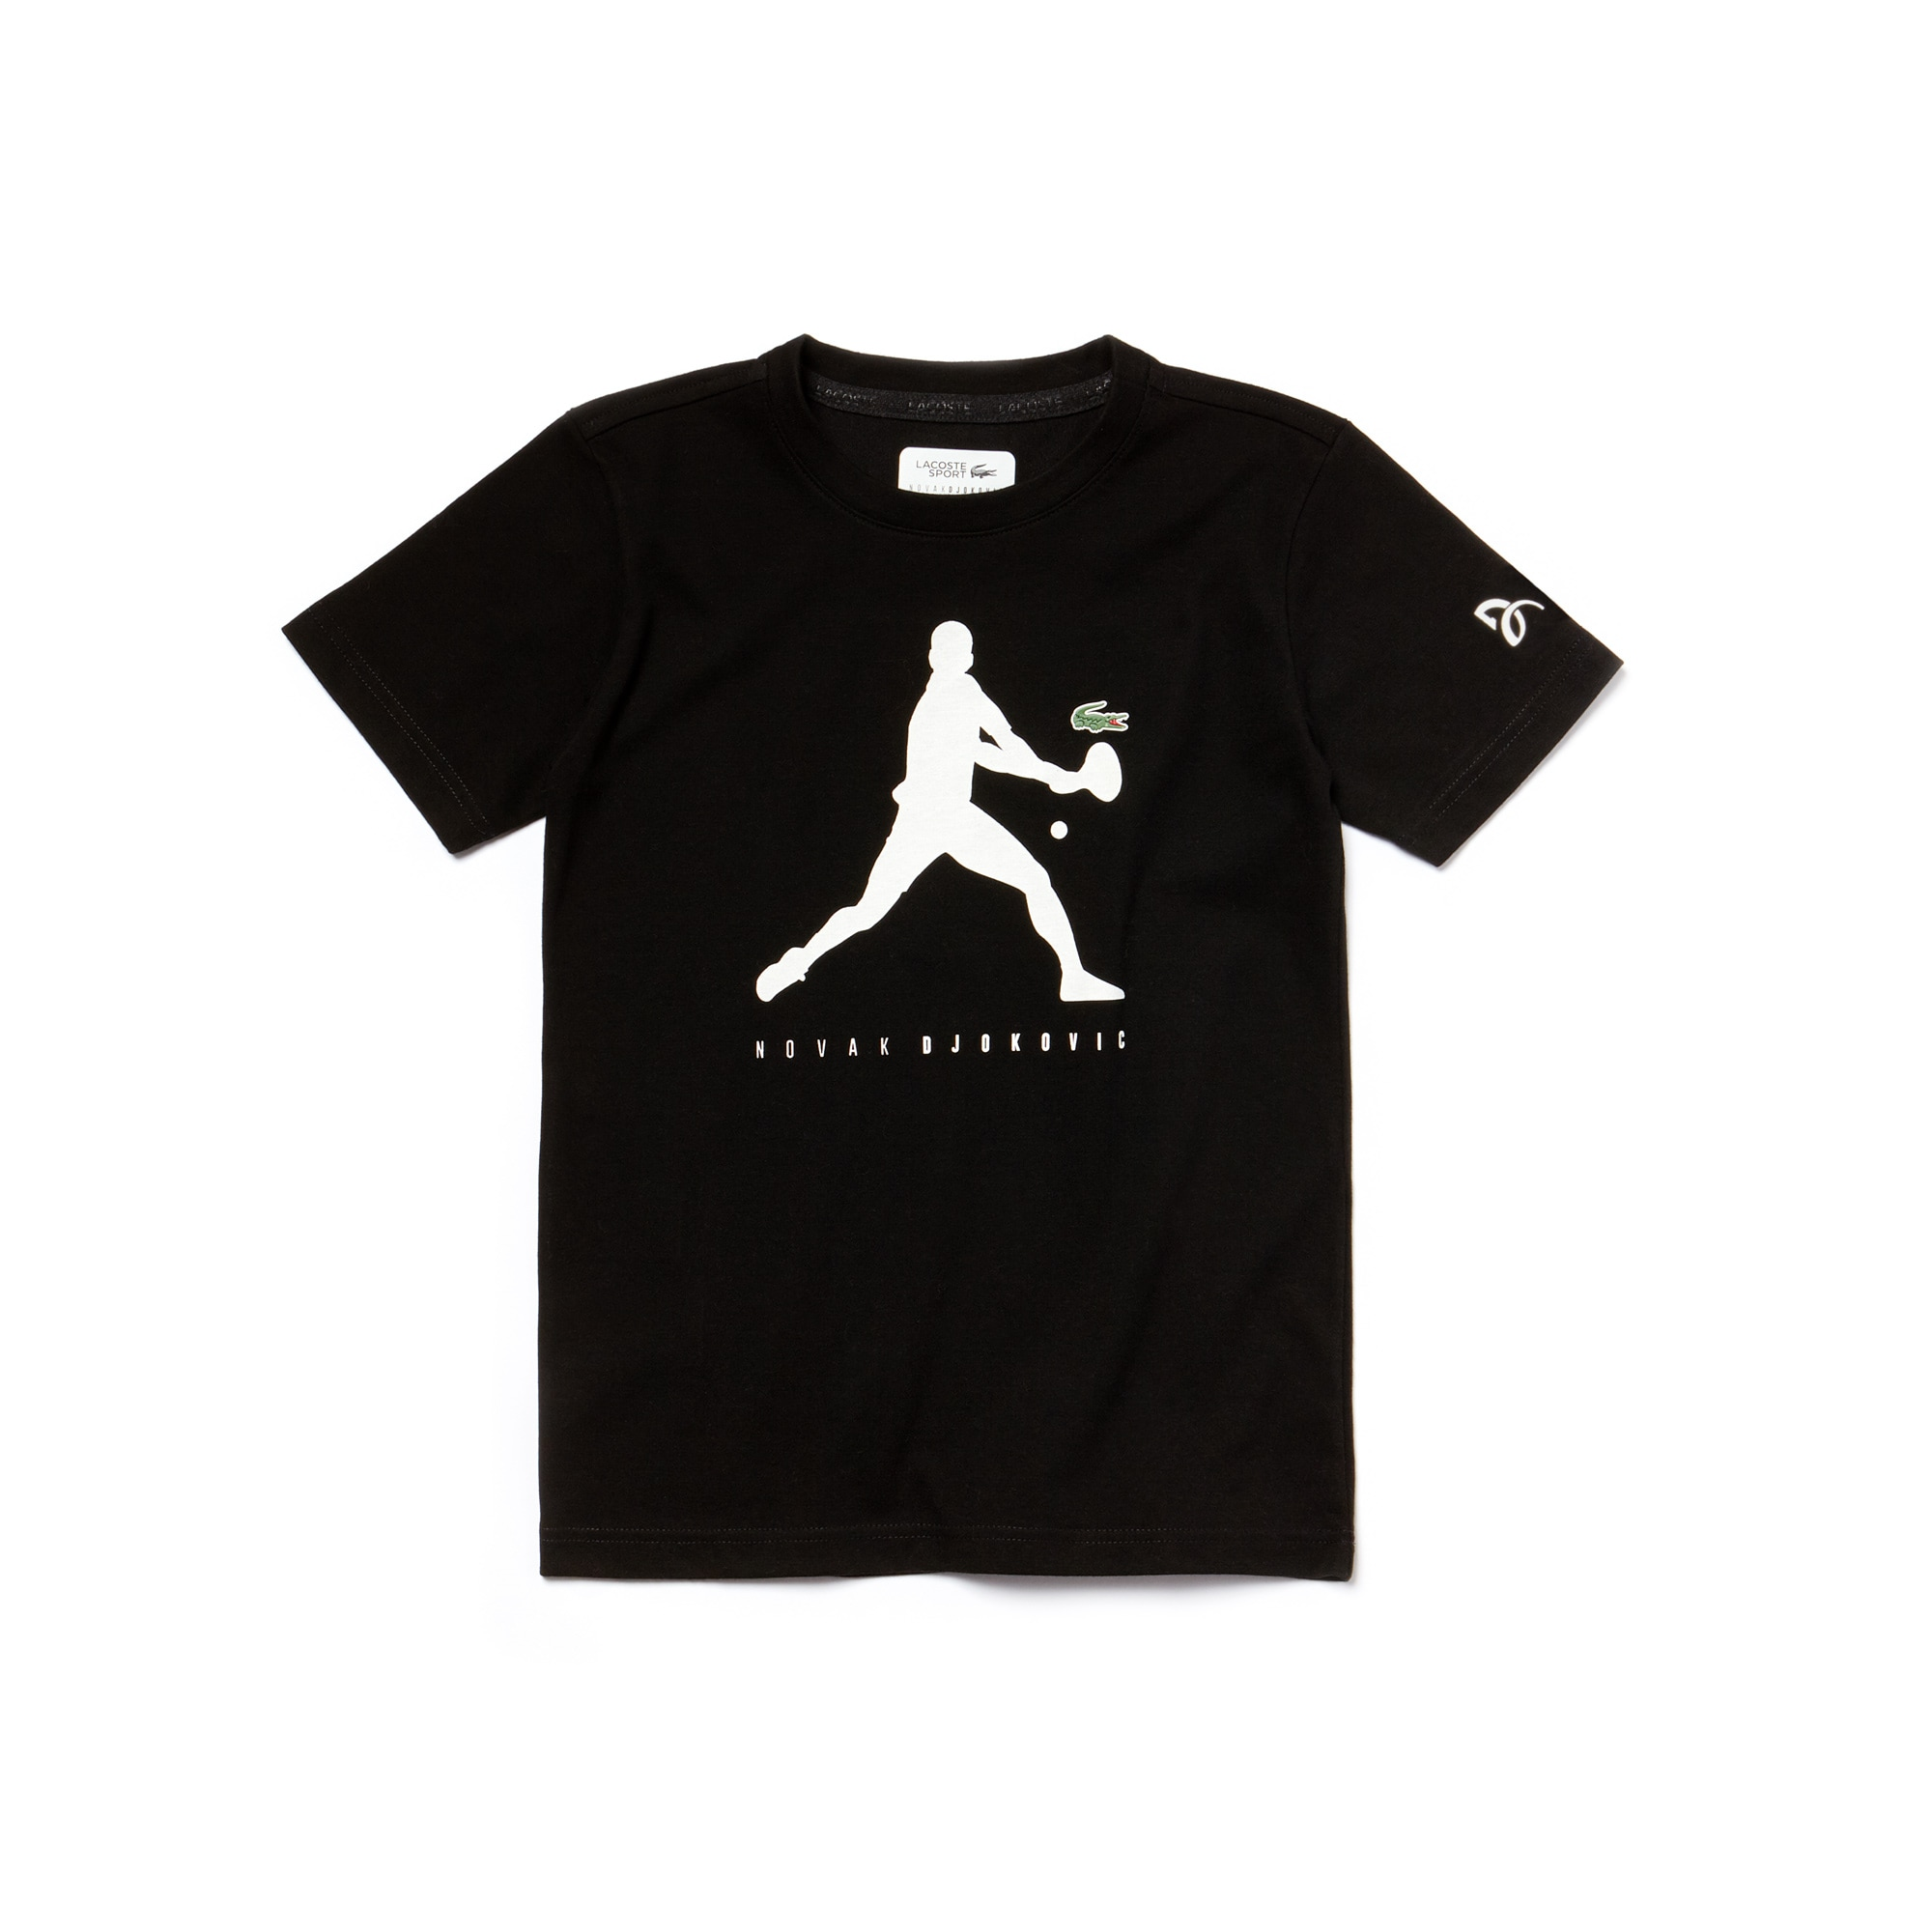 Camiseta de niño Lacoste SPORT COLLECTION NOVAK DJOKOVIC SUPPORT WITH STYLE de punto jersey técnico